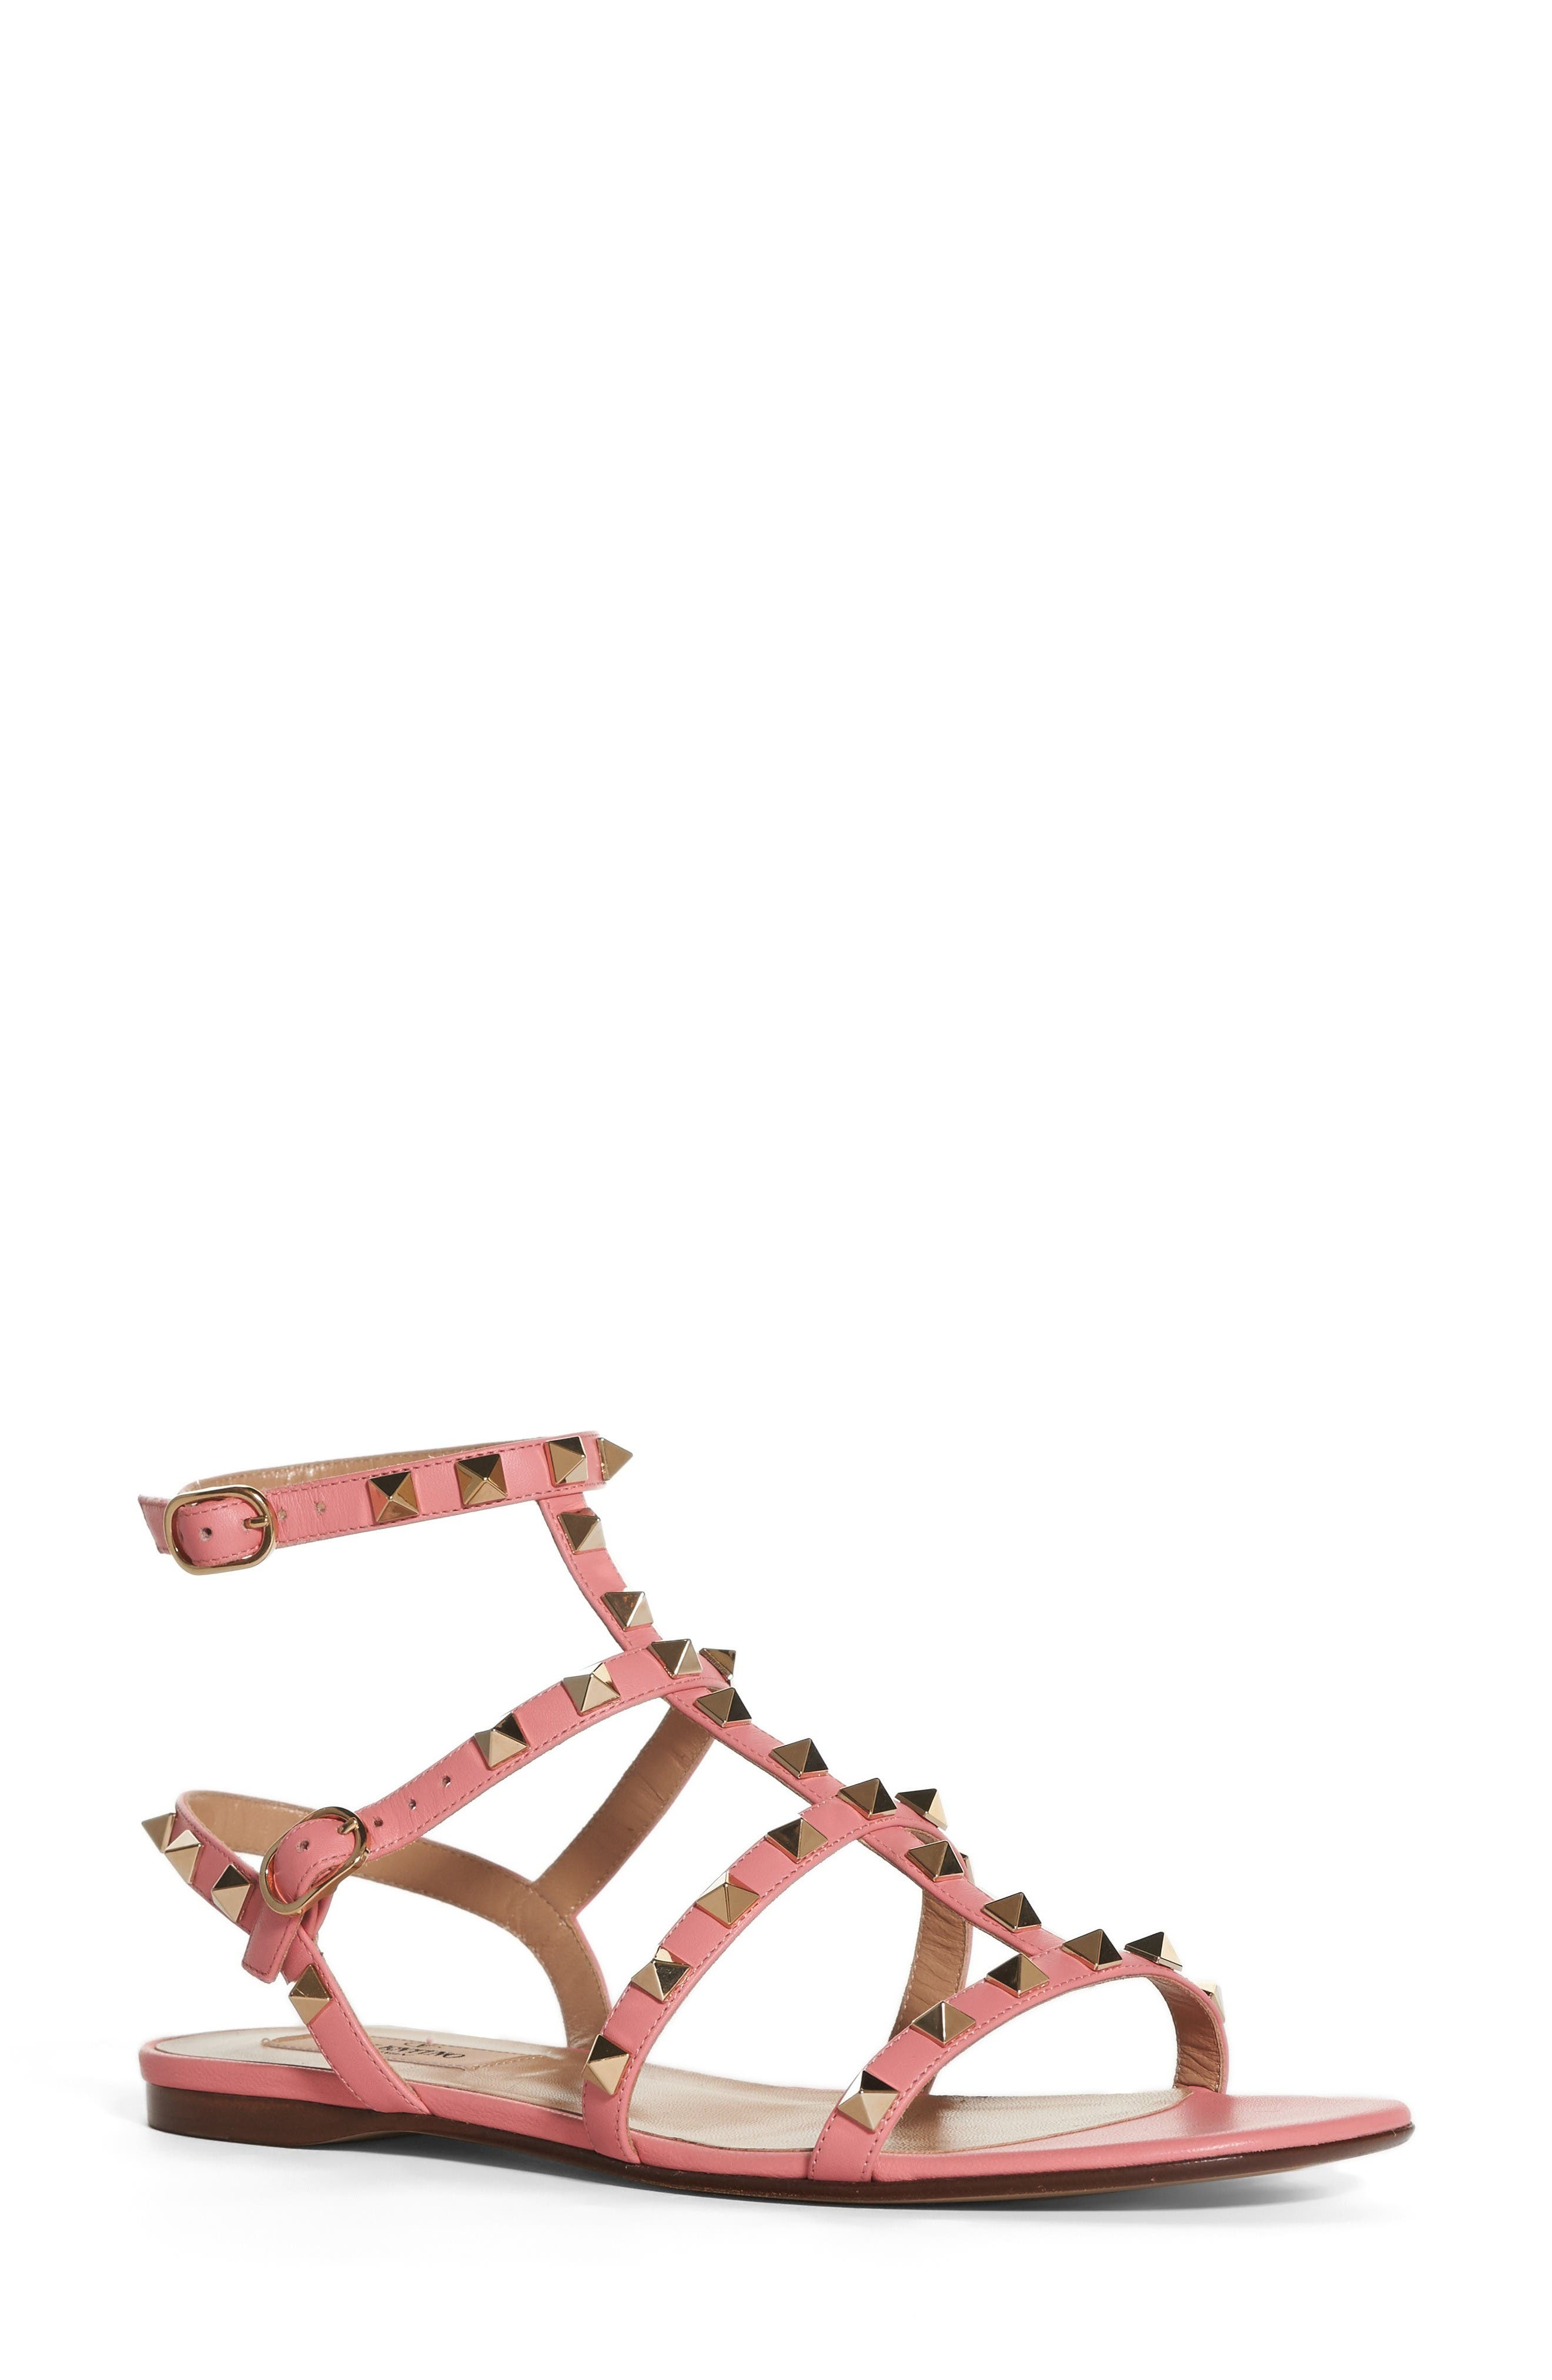 VALENTINO Rockstud Gladiator Sandal